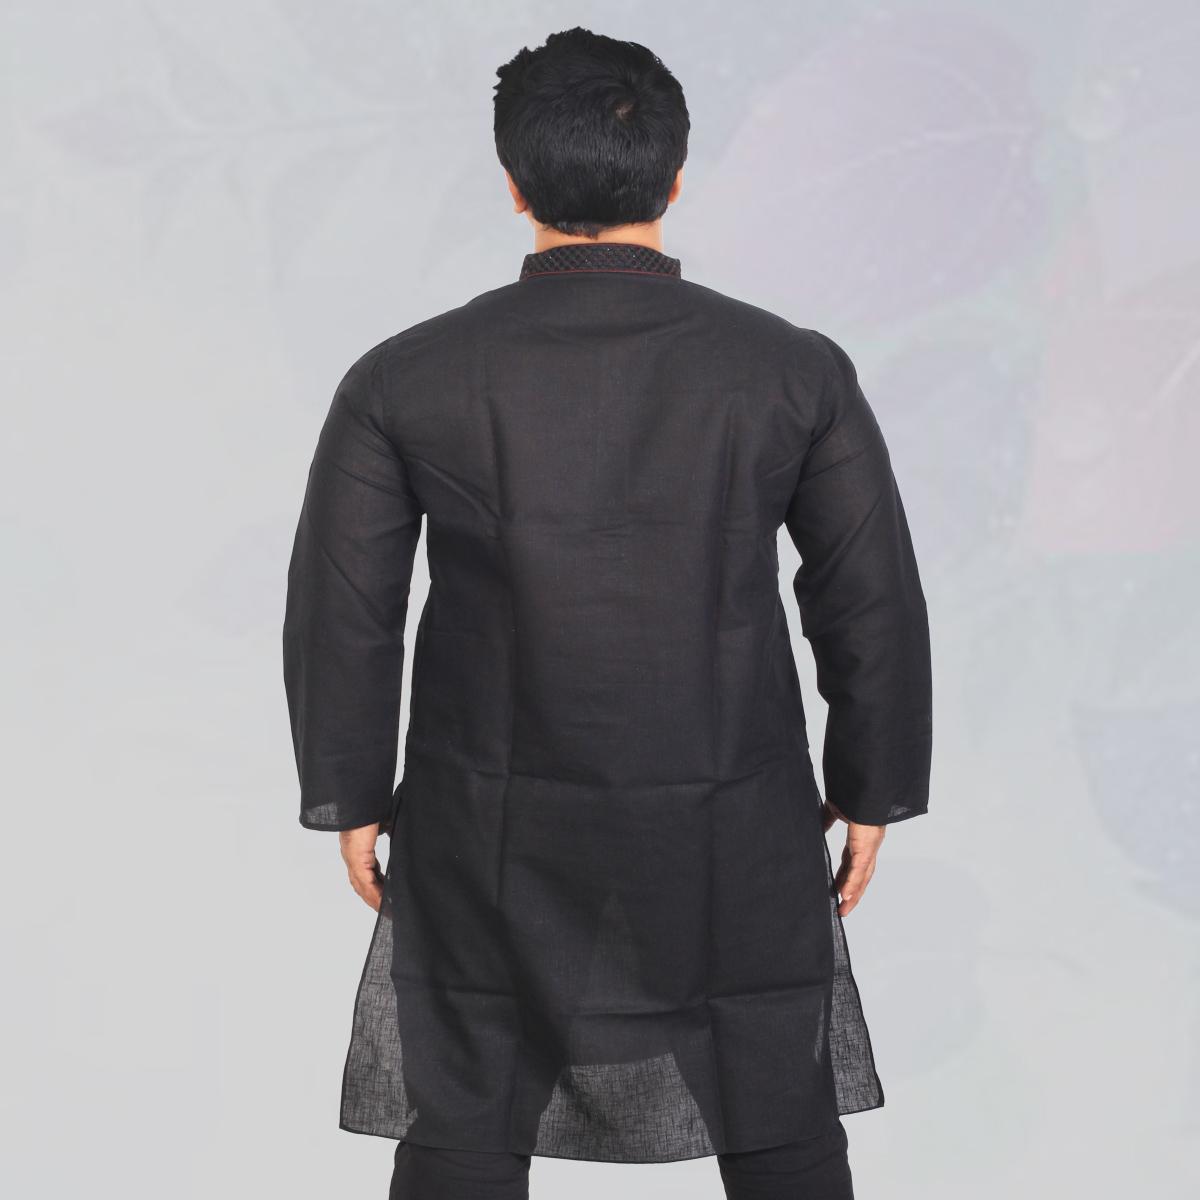 Rupok Fashion